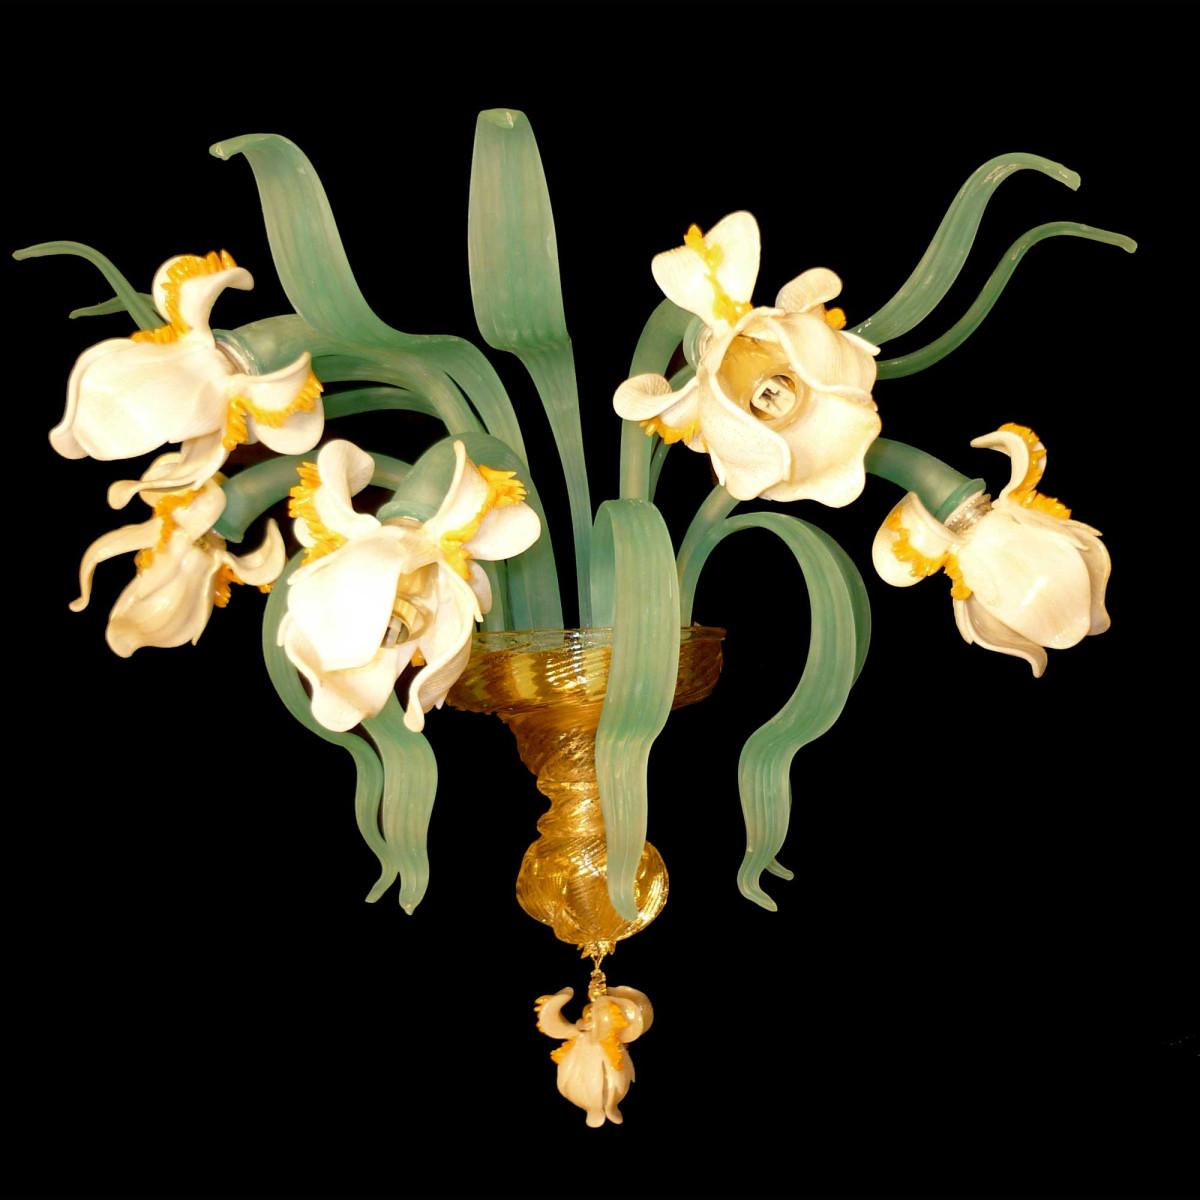 """Iris bianco"" 5 lights Murano glass wall sconce"